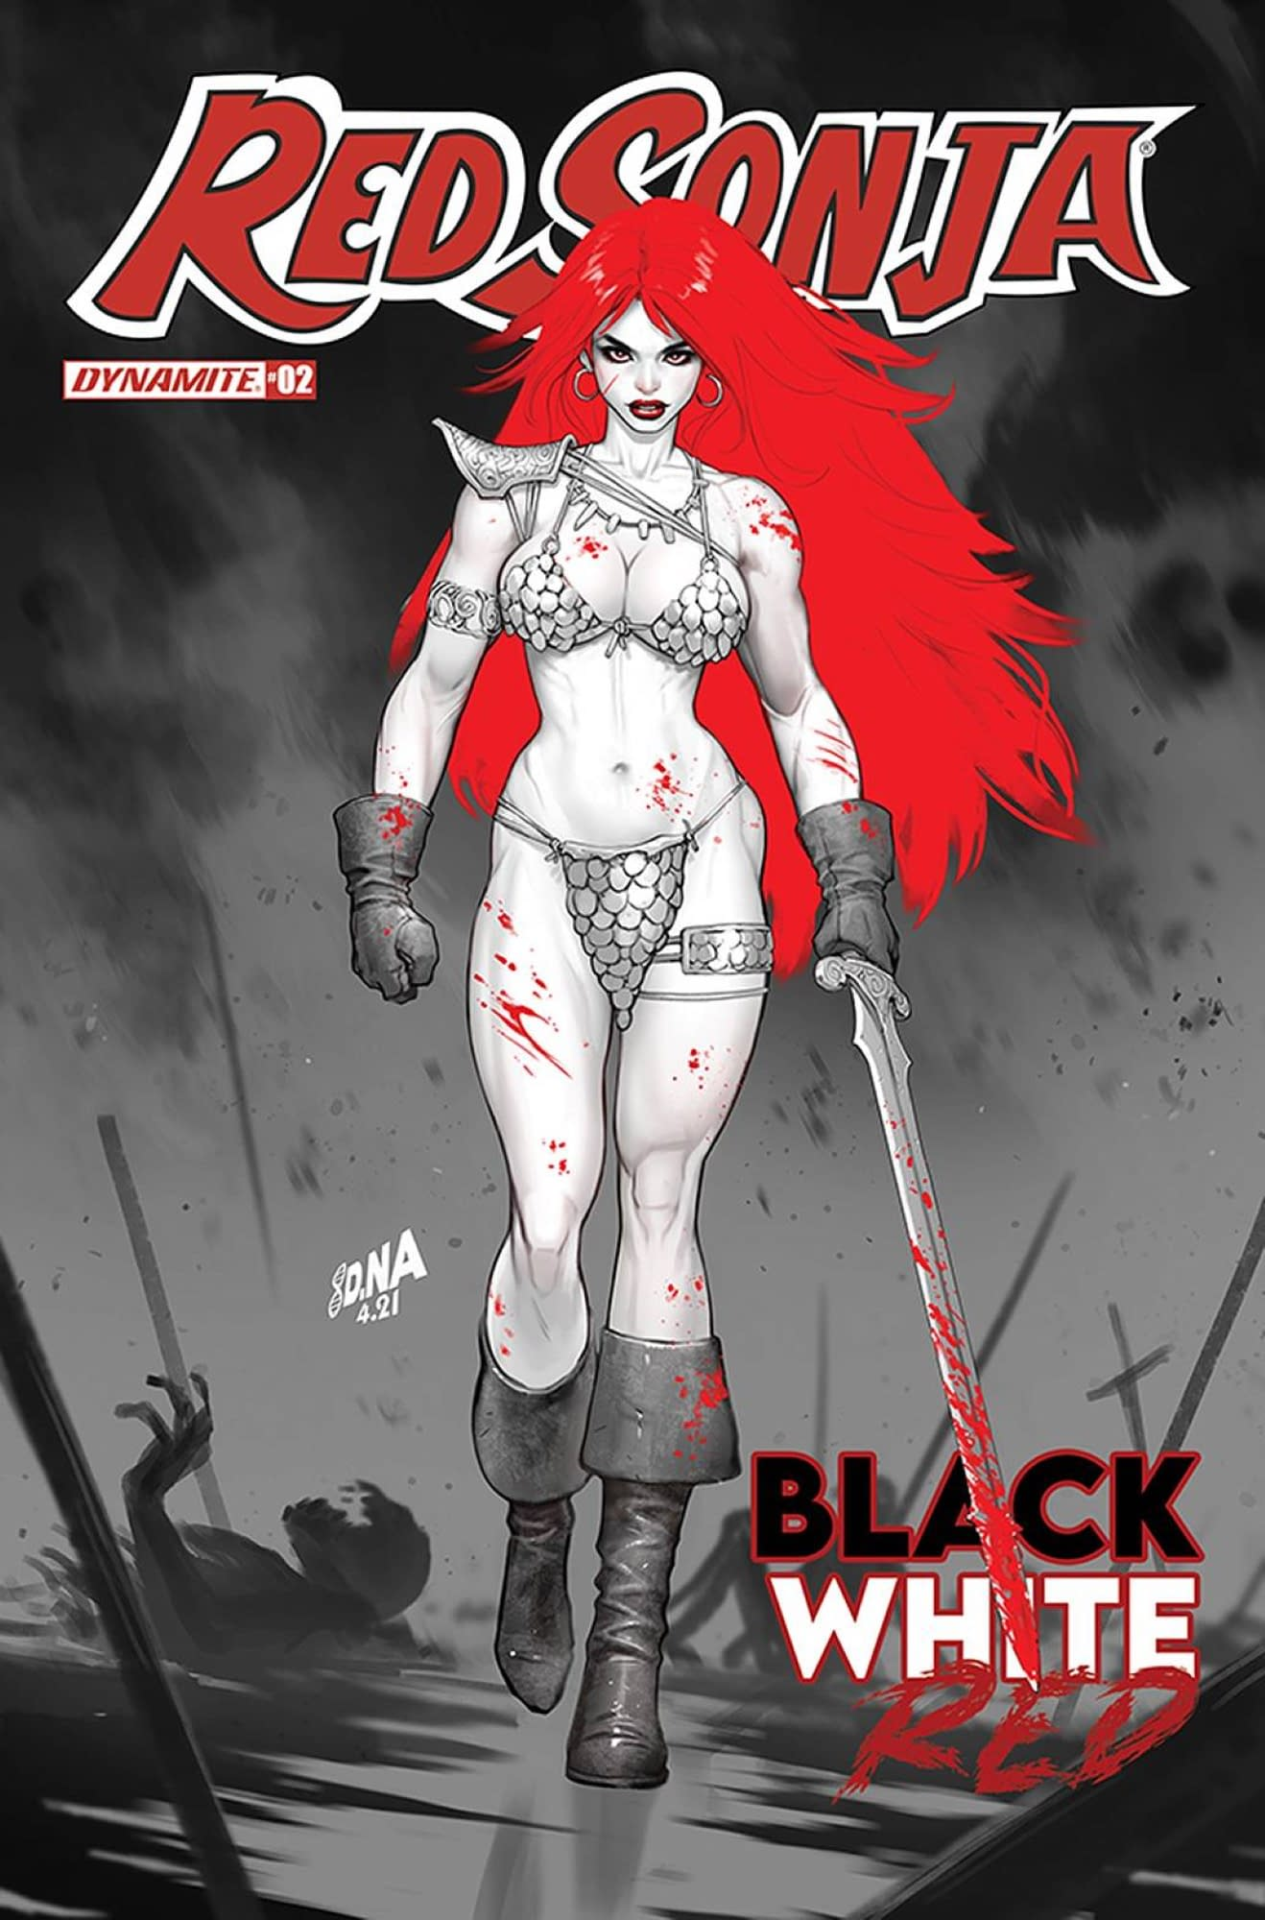 RED SONJA BLACK WHITE RED #2 CVR C NAKAYAMA